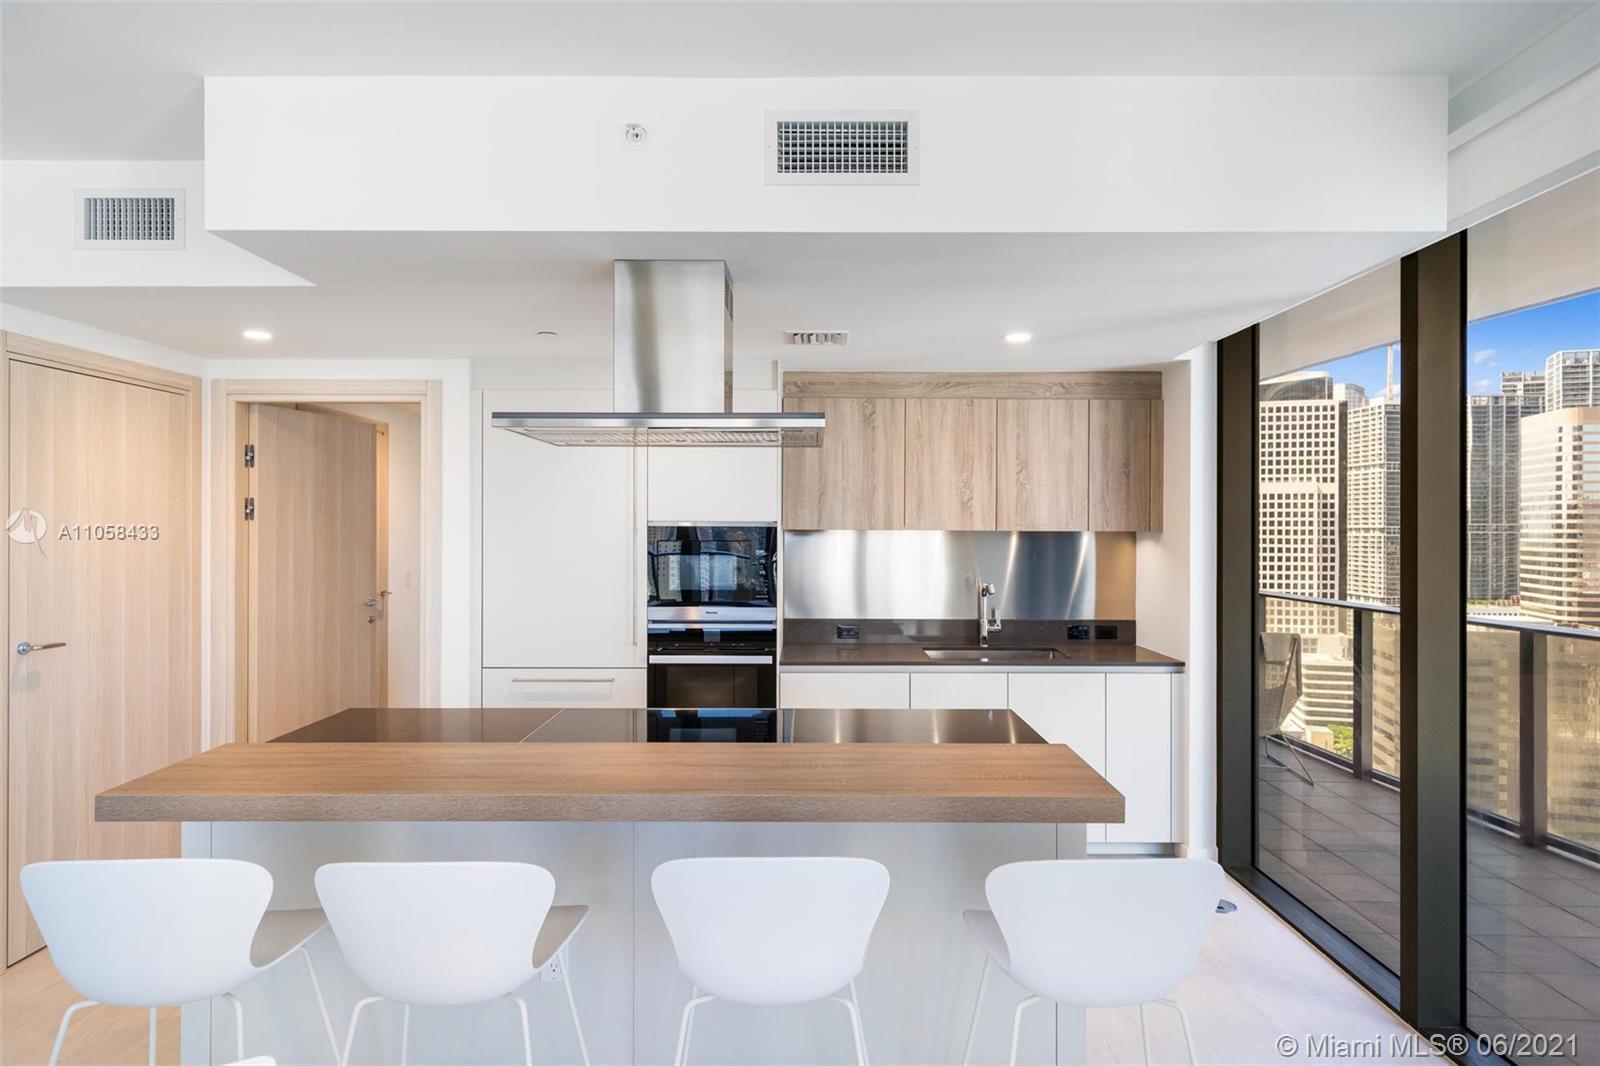 Ugo Colombo' newest luxury condo development Brickell Flatiron; a 64-story glass tower featuring the